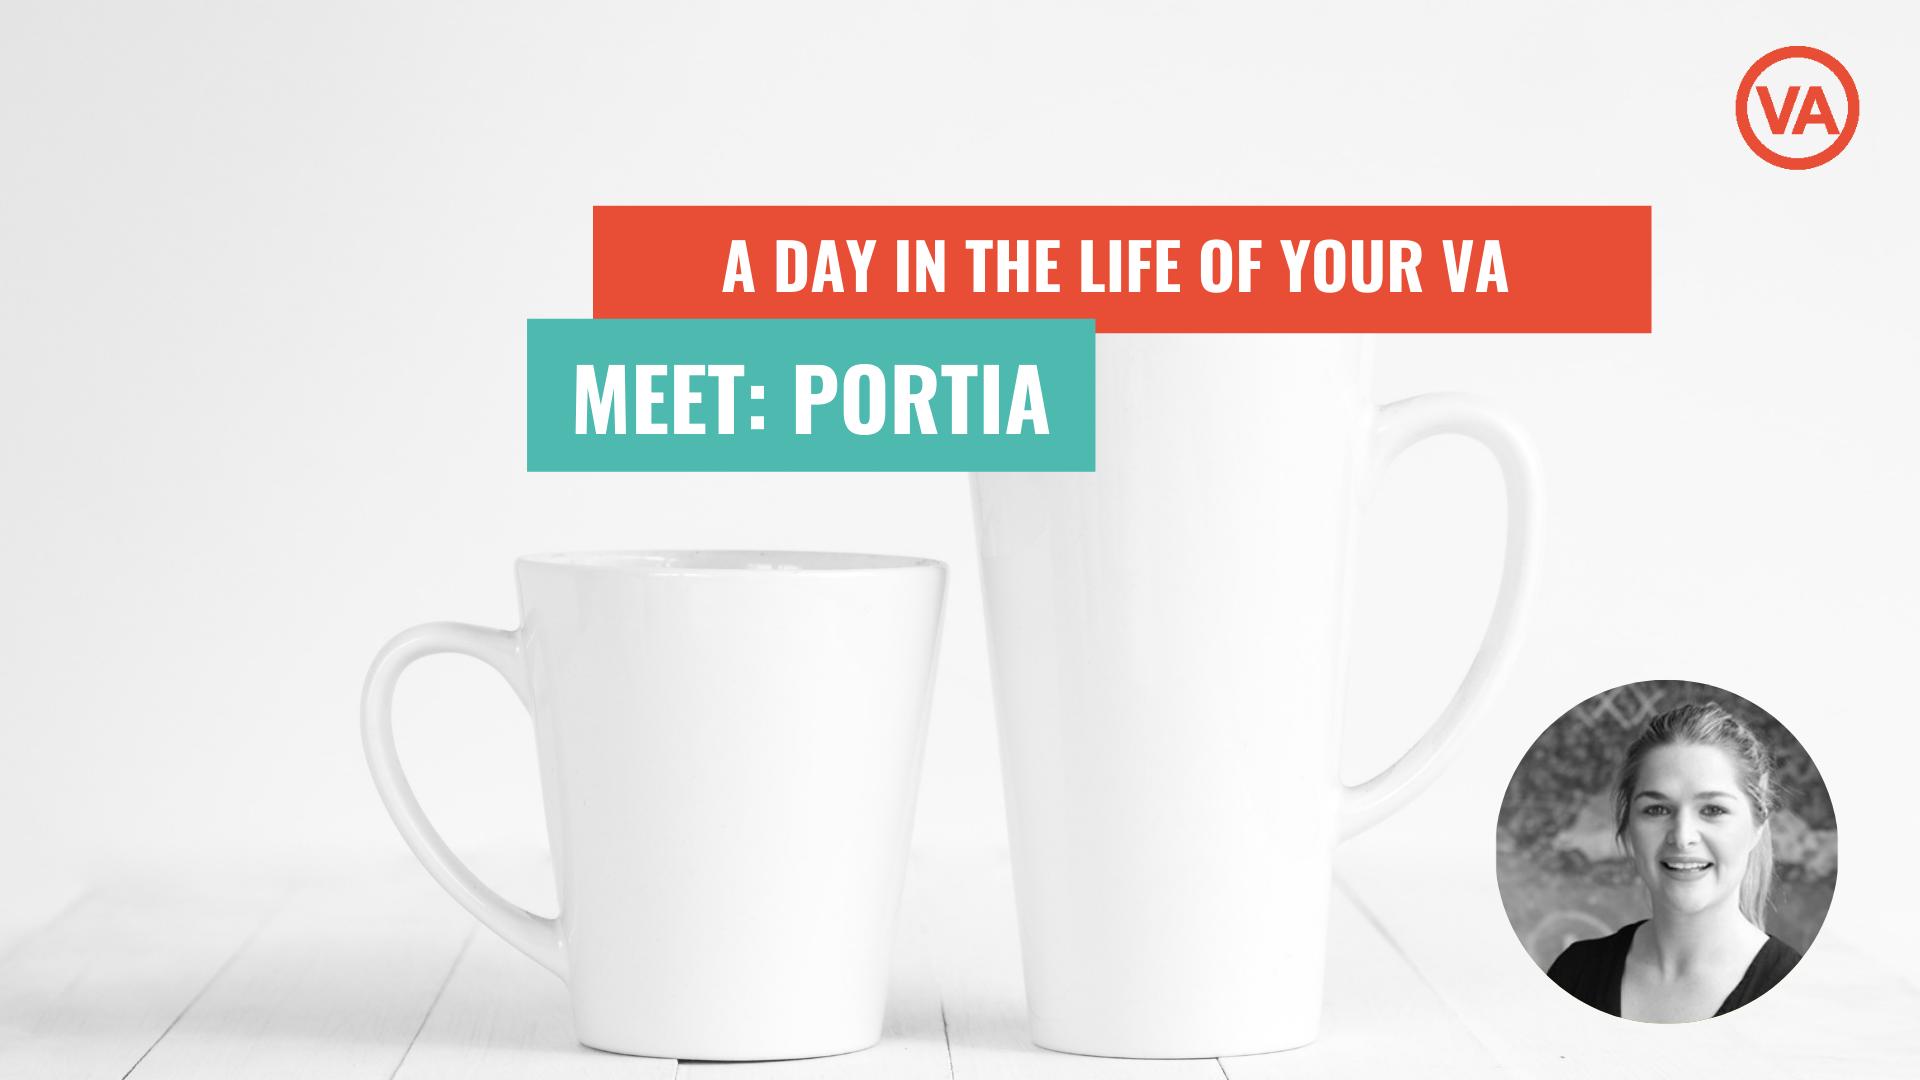 A Day in the Life of a VA: Meet Portia